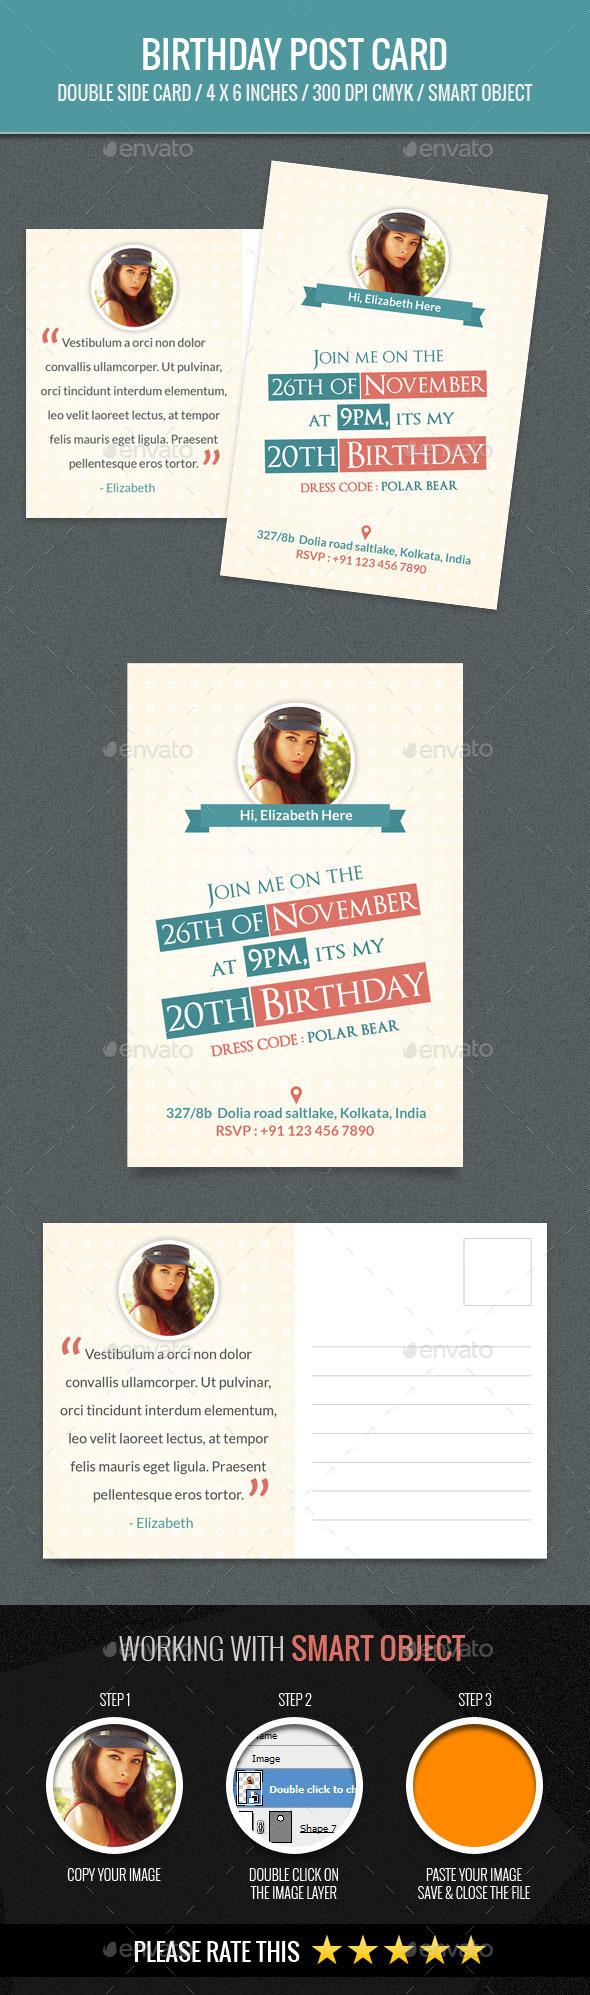 Birthday PostCard Template - Birthday Greeting Cards